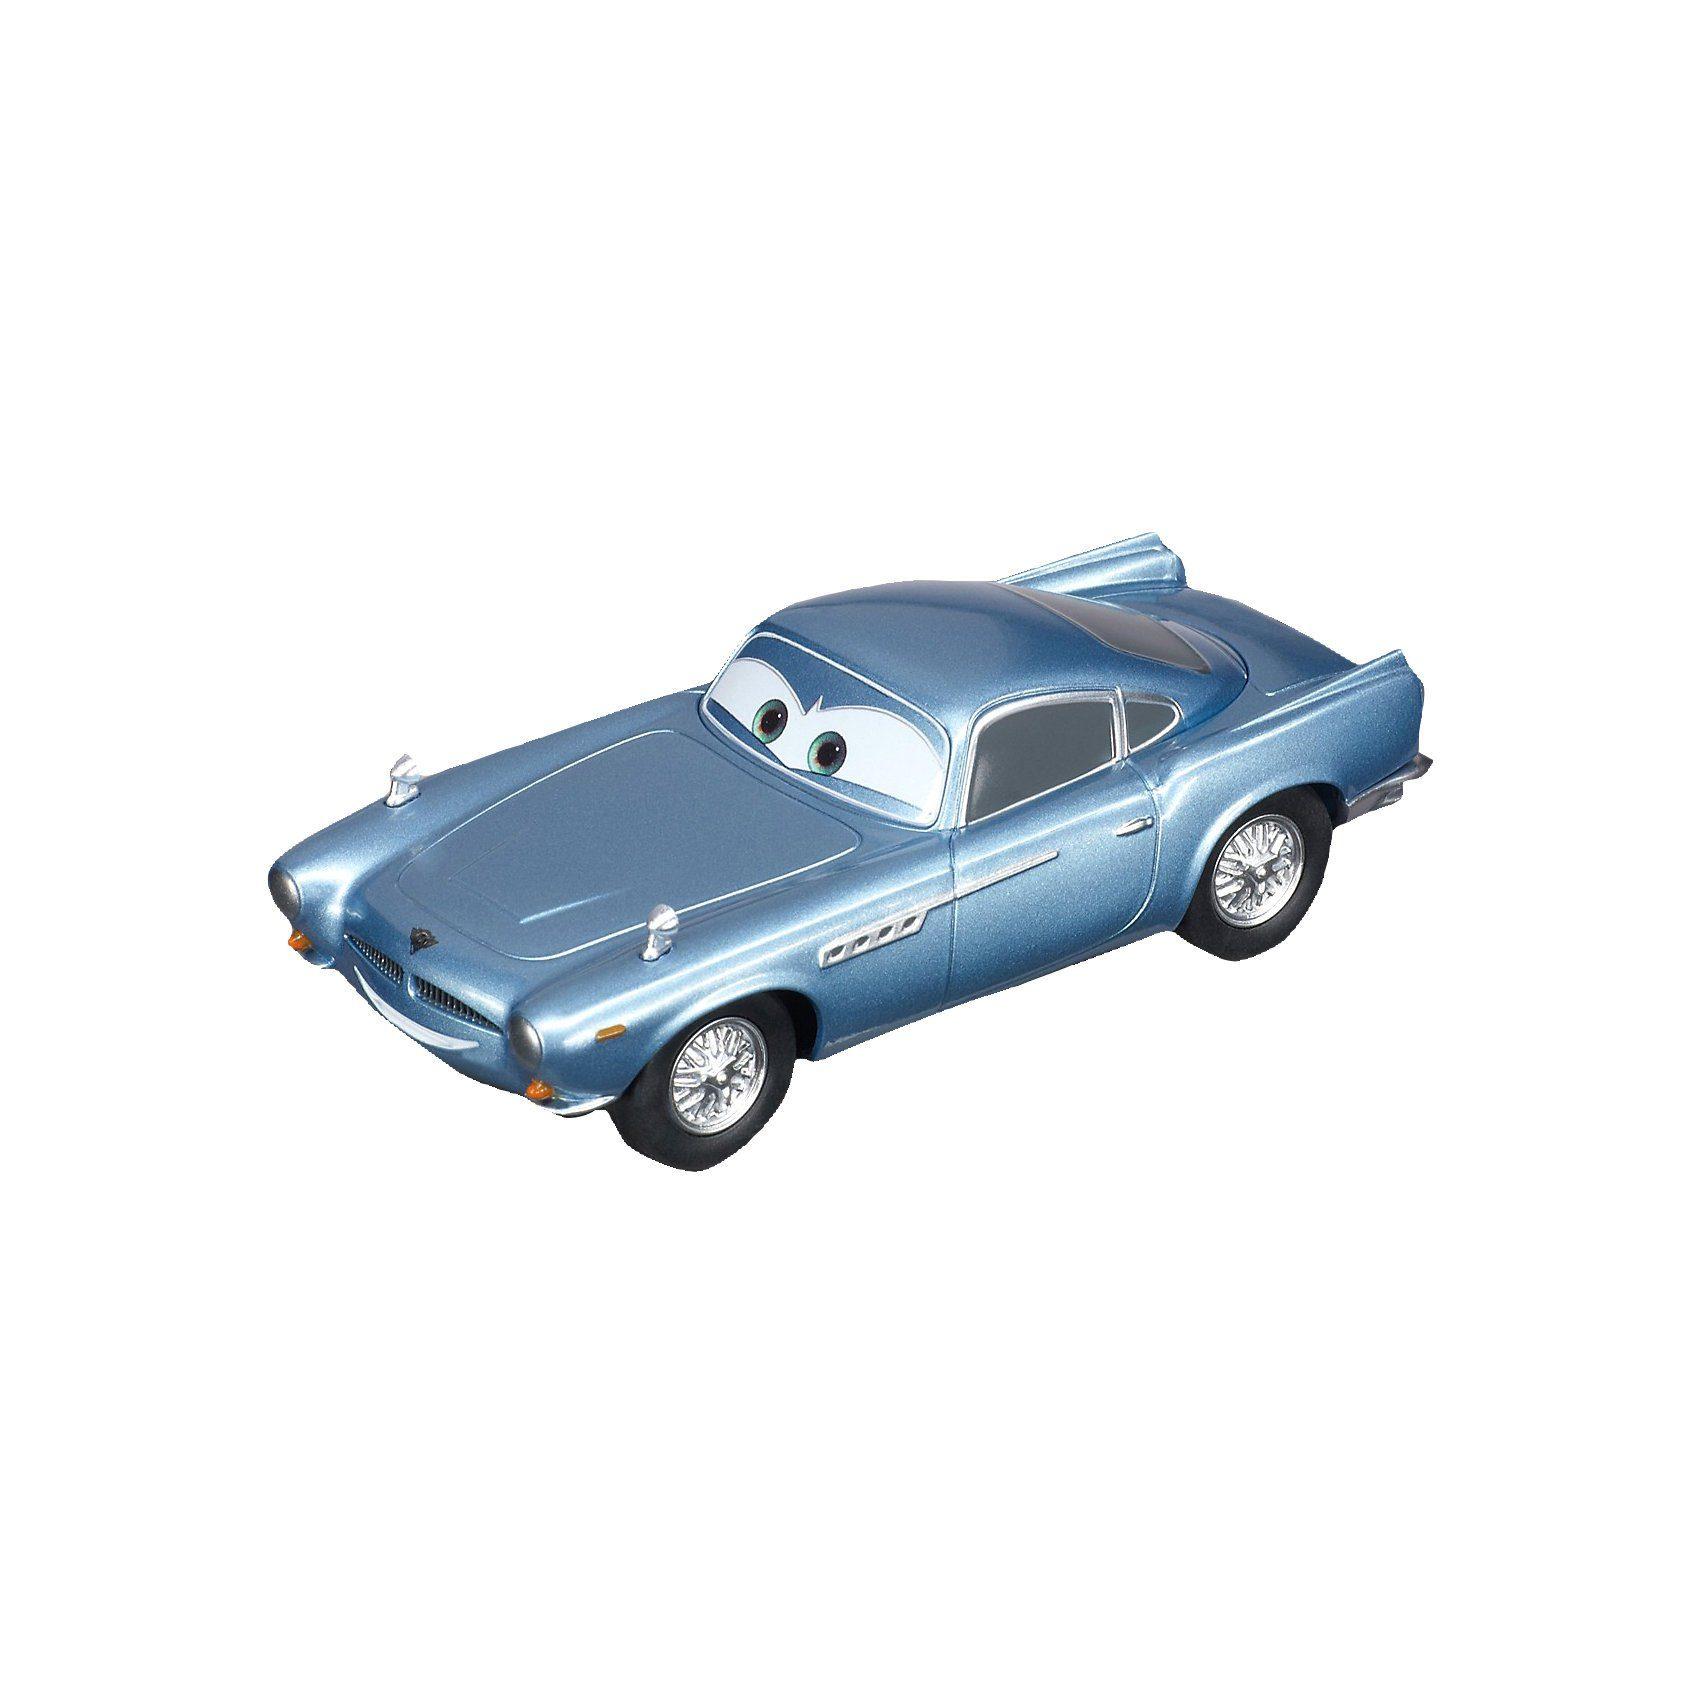 "Carrera GO!!! 61195 Disney Cars 2 ""Finn McMissile"""